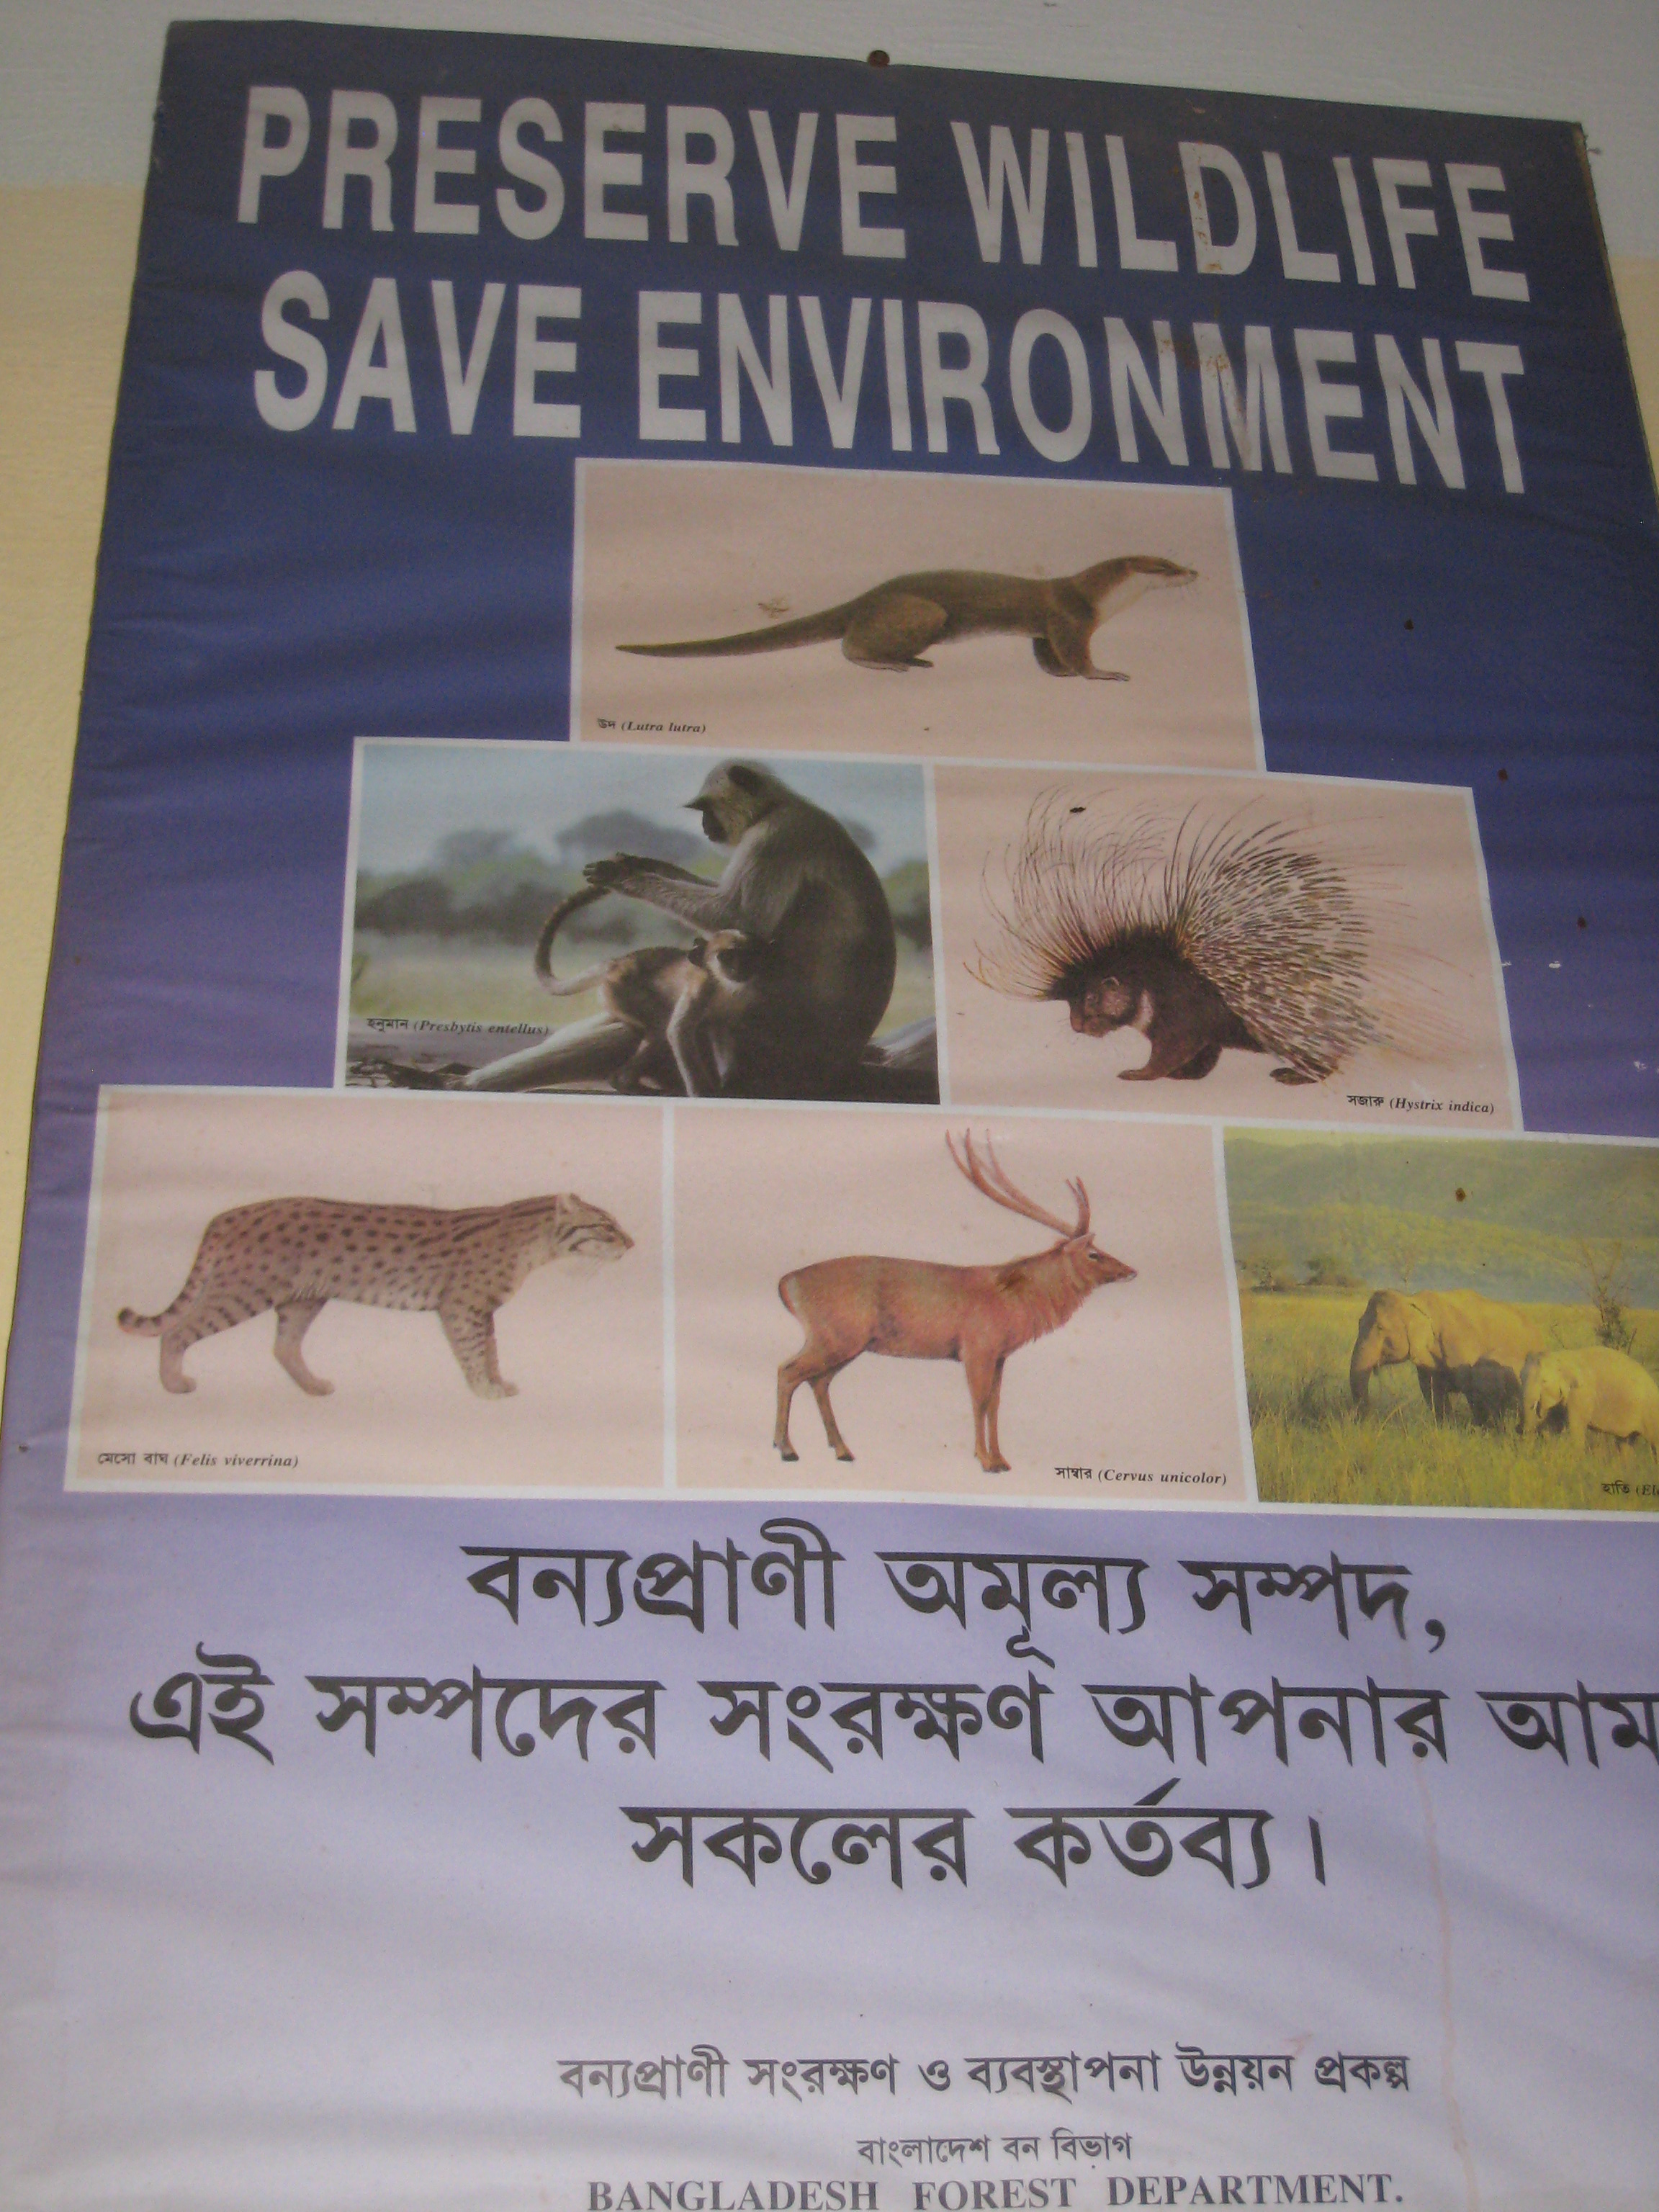 A wildlife preservation poster